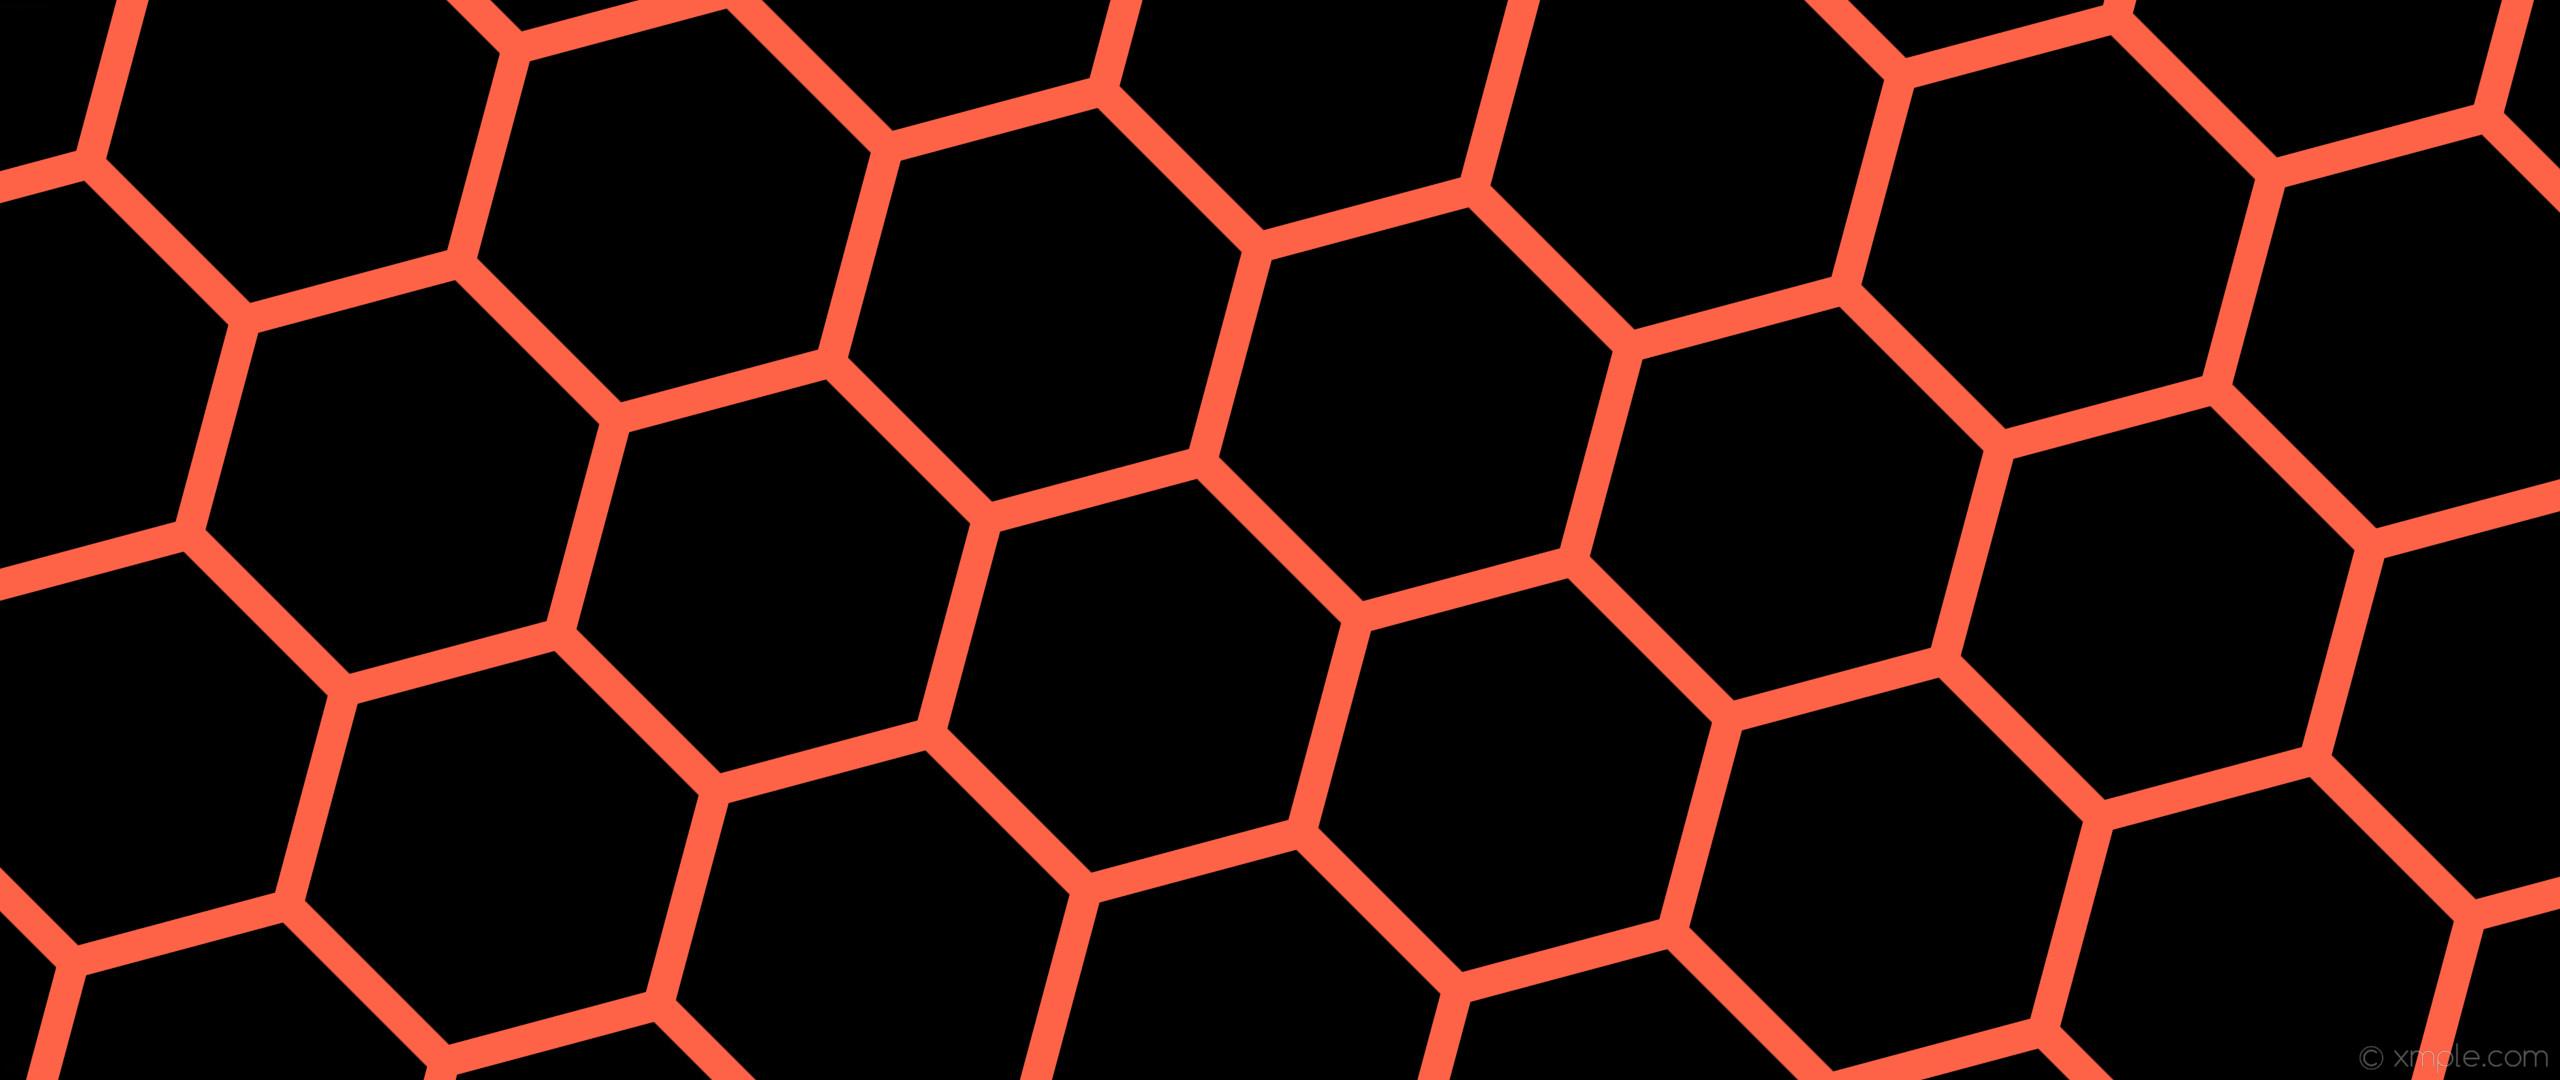 wallpaper beehive black honeycomb orange hexagon tomato #000000 #ff6347  diagonal 45° 31px 384px